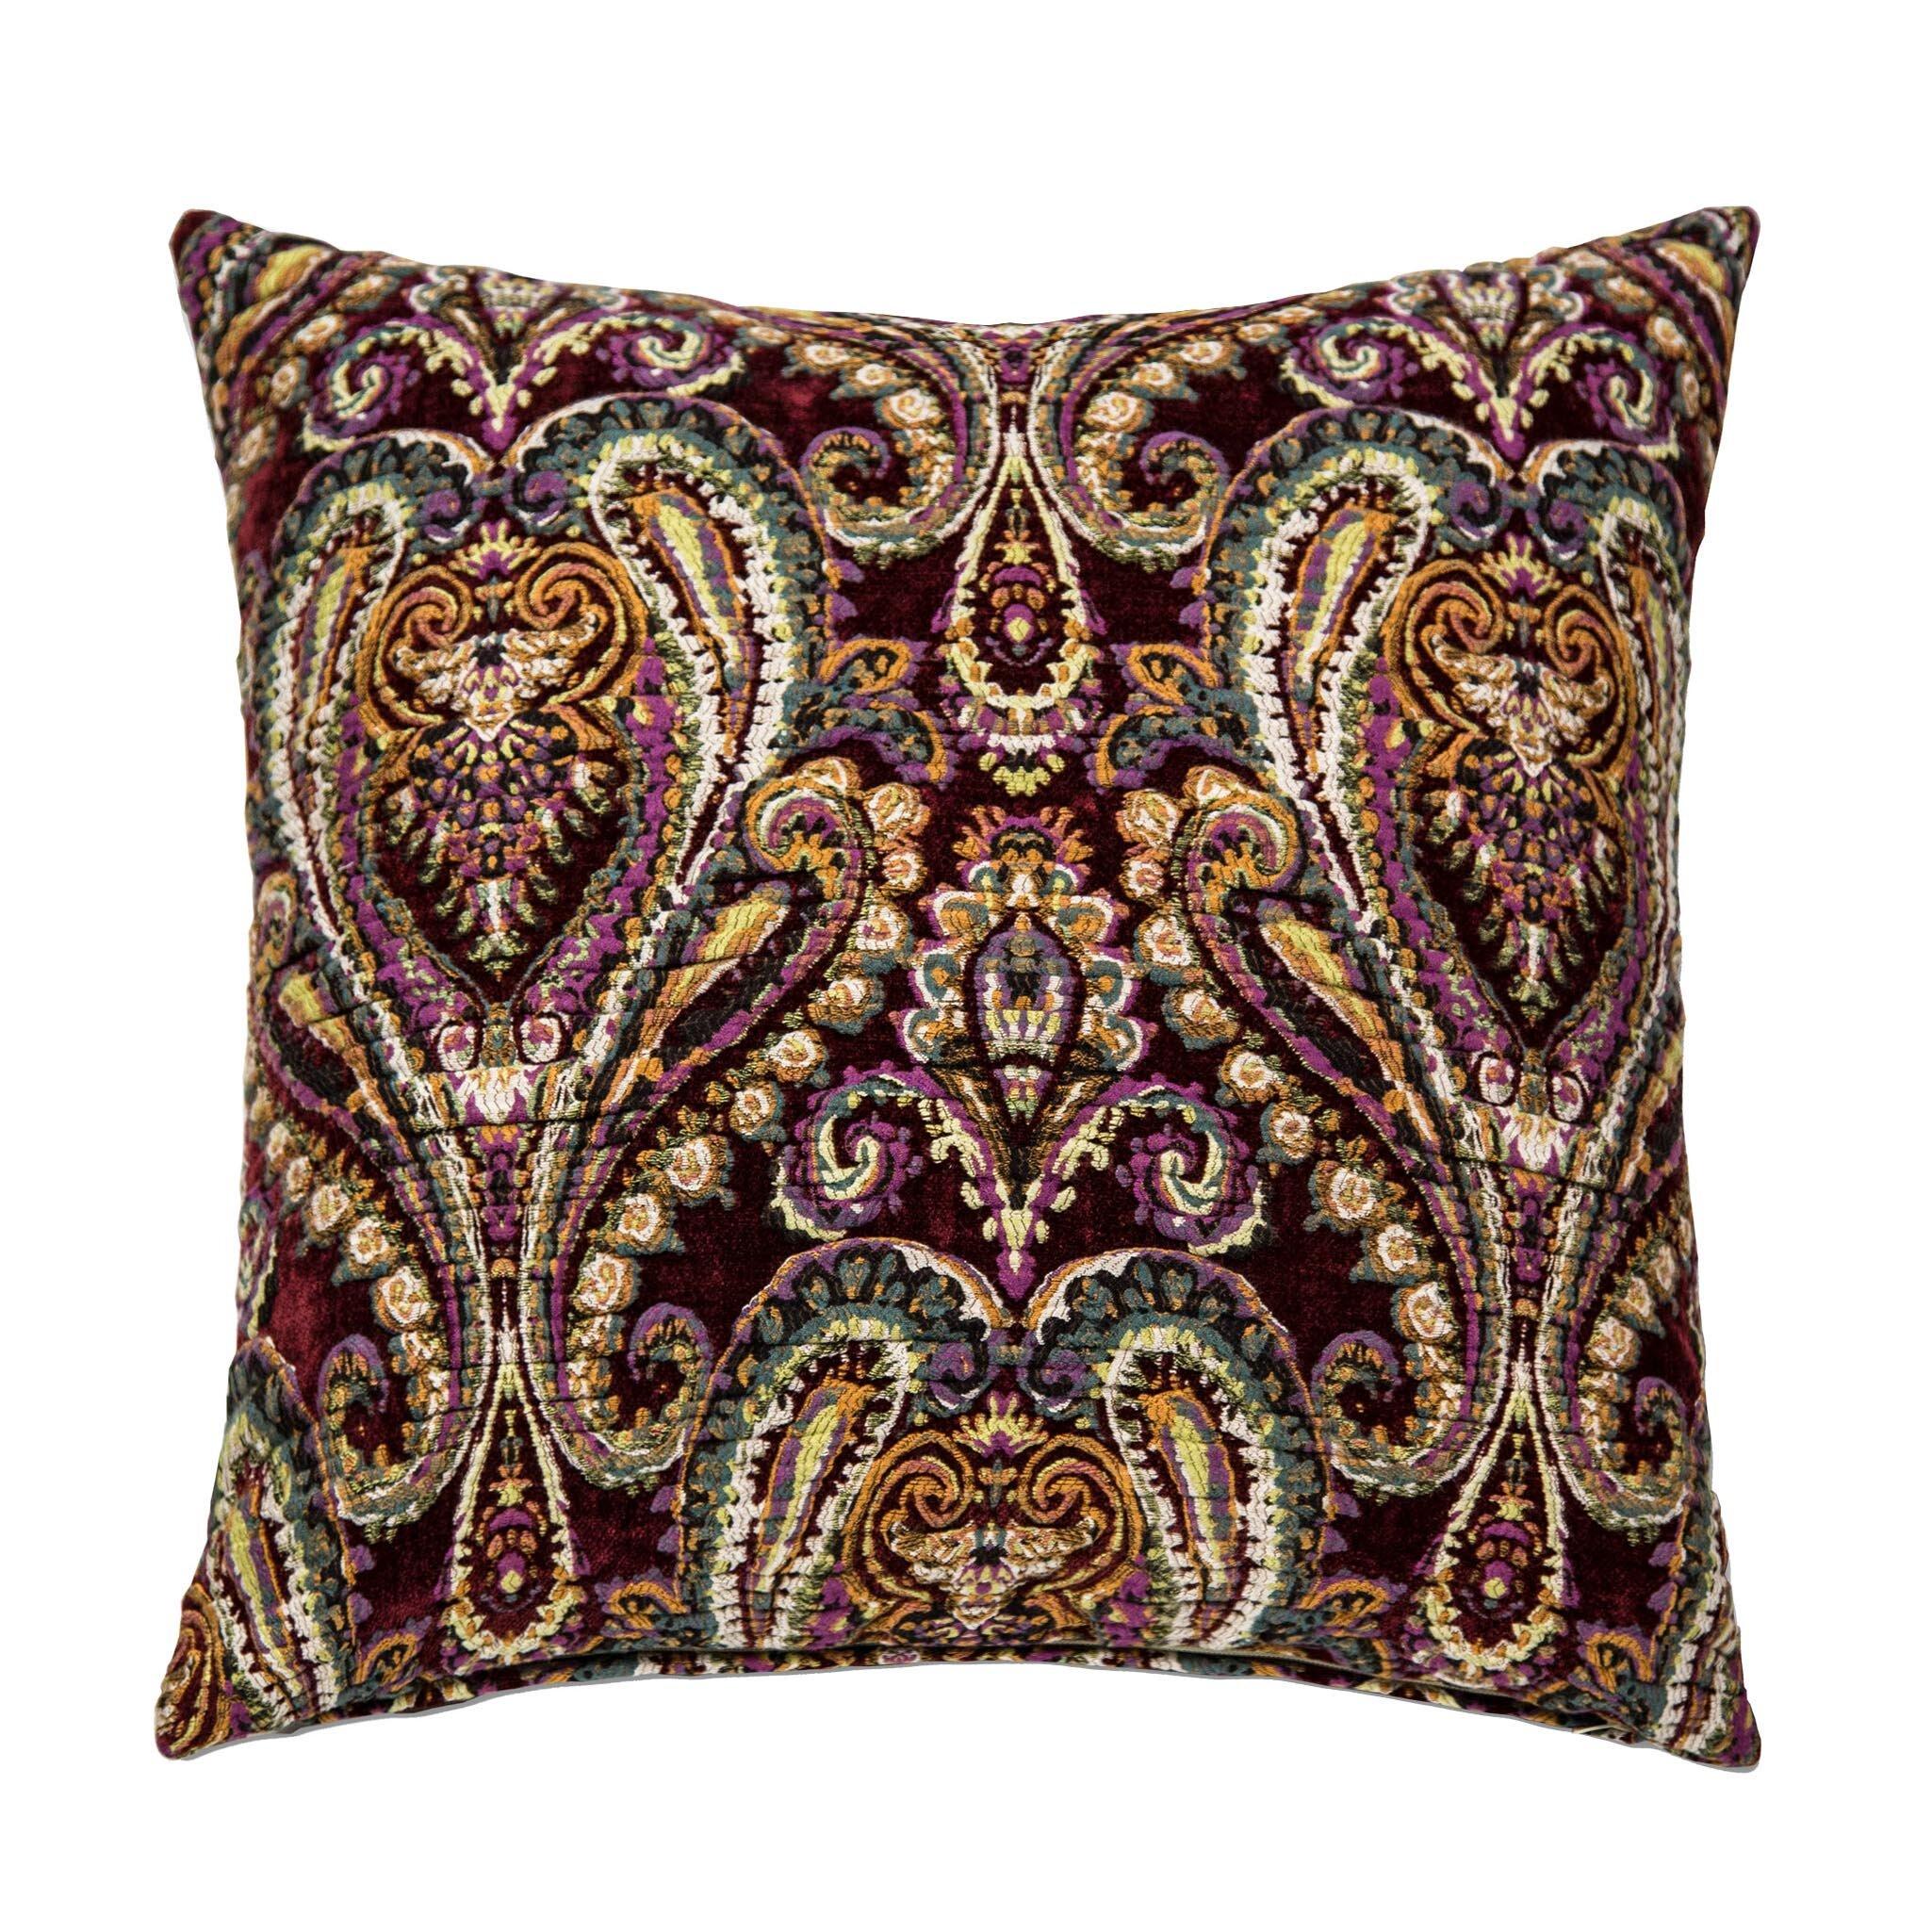 Throw Pillows Matching Curtains : Michael Amini Hudson Throw Pillow Wayfair